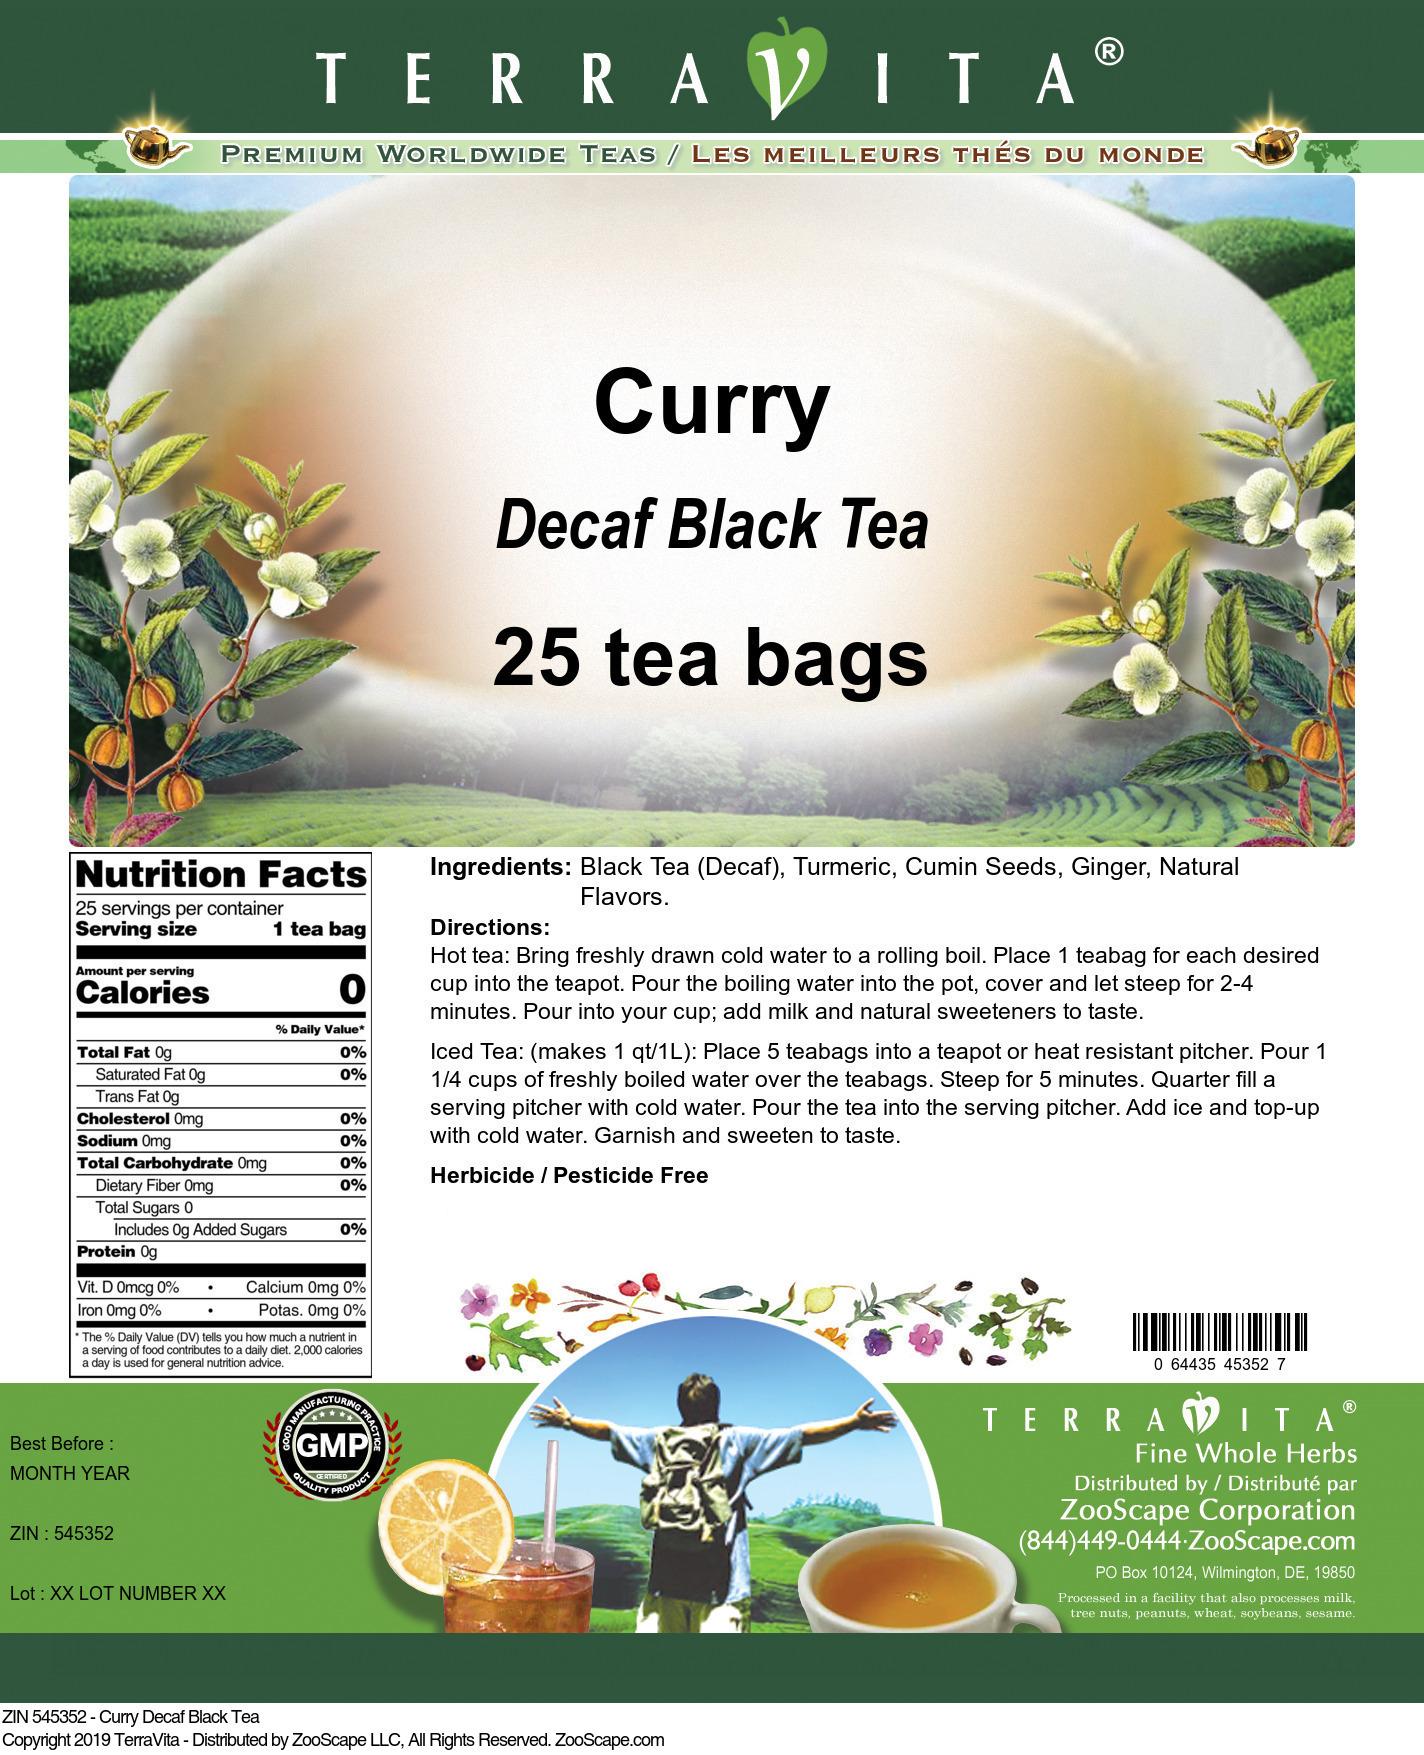 Curry Decaf Black Tea